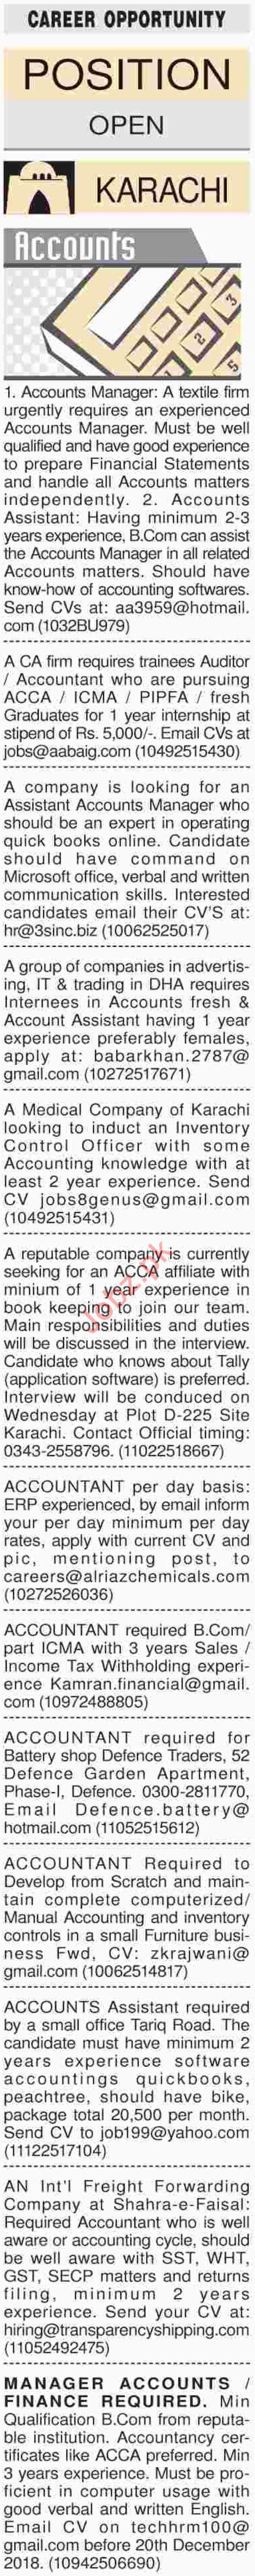 Dawn Sunday Classified Ads 16th Dec 2018 Accounts Staff